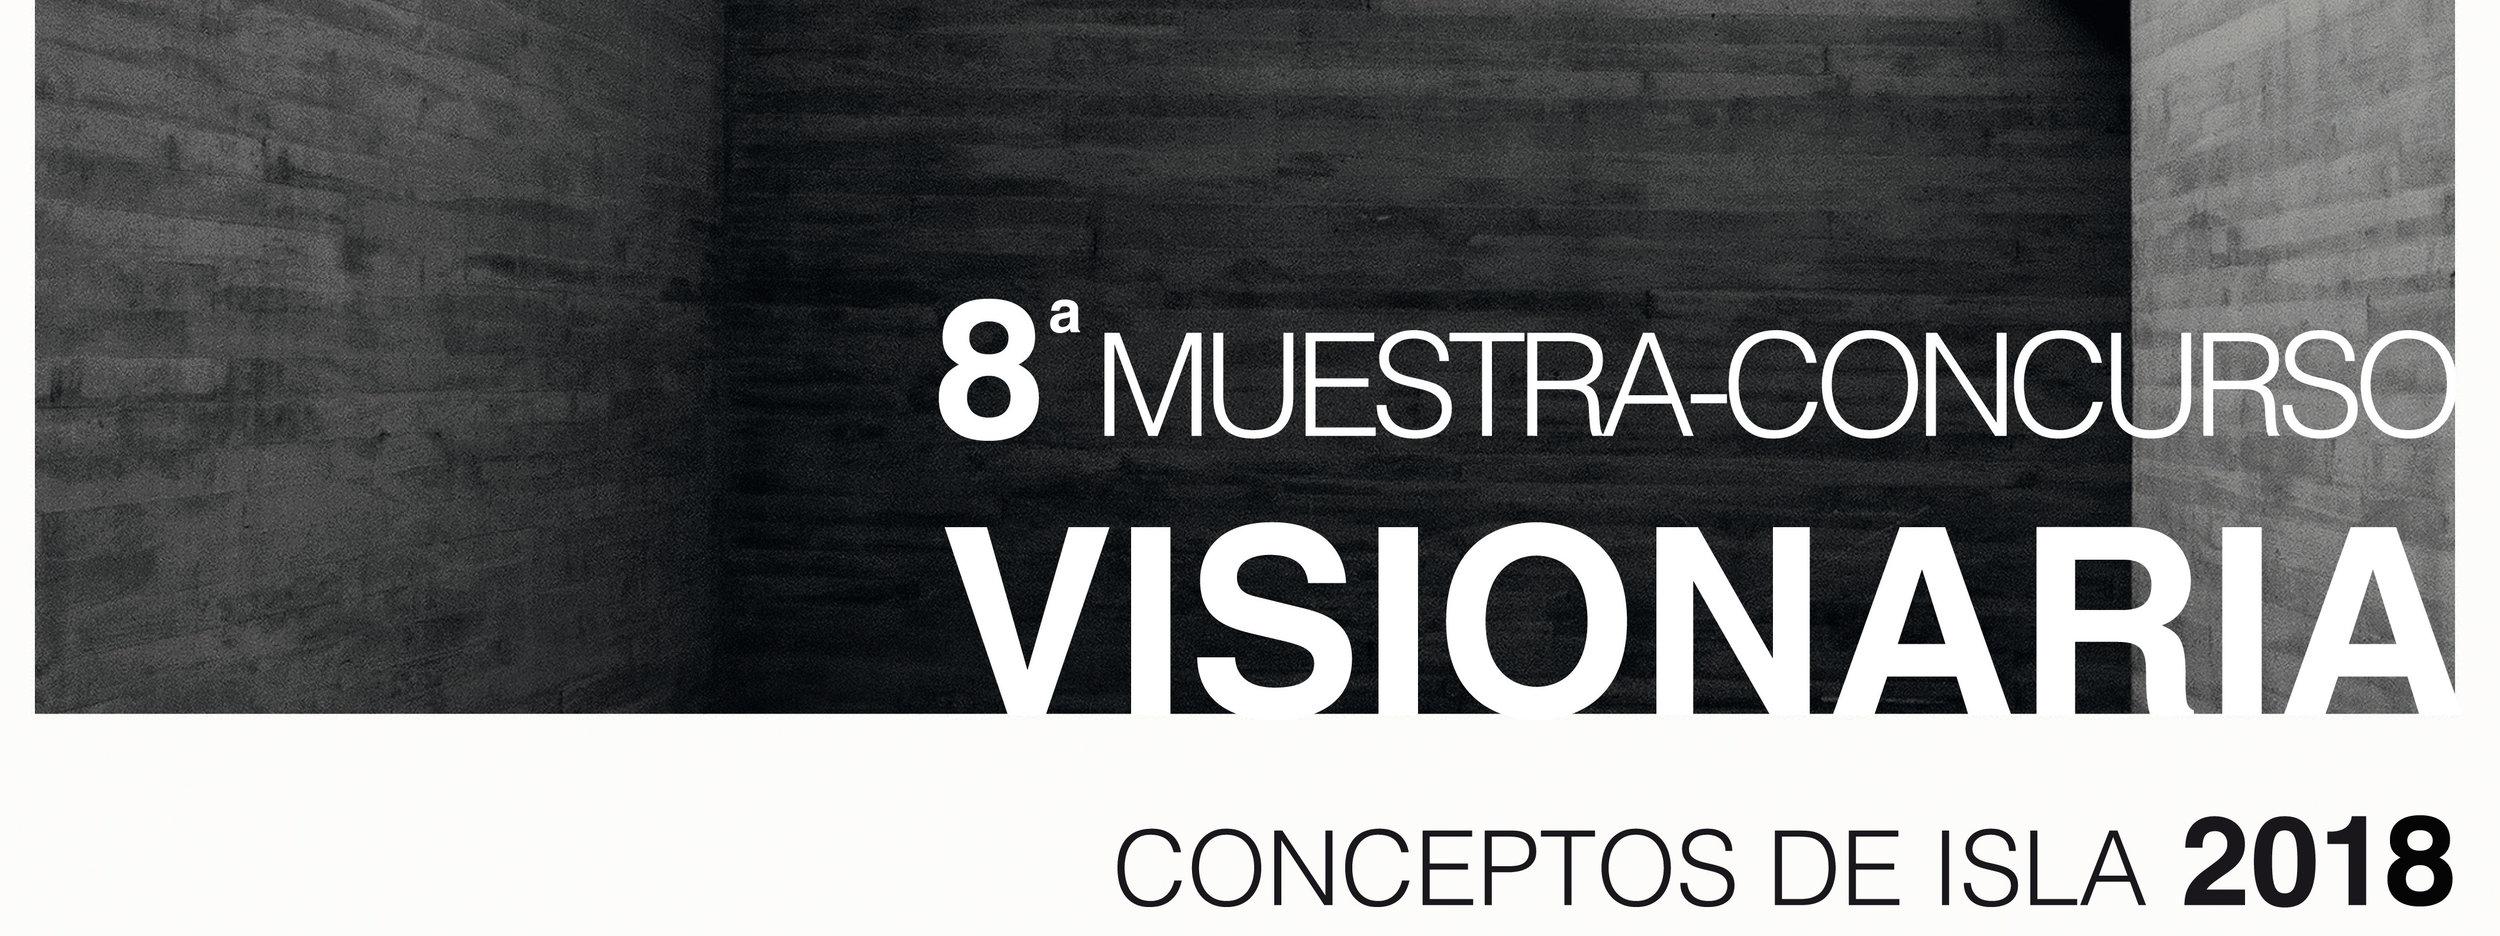 VISIONARIA 2018 cabecera facebook.jpg